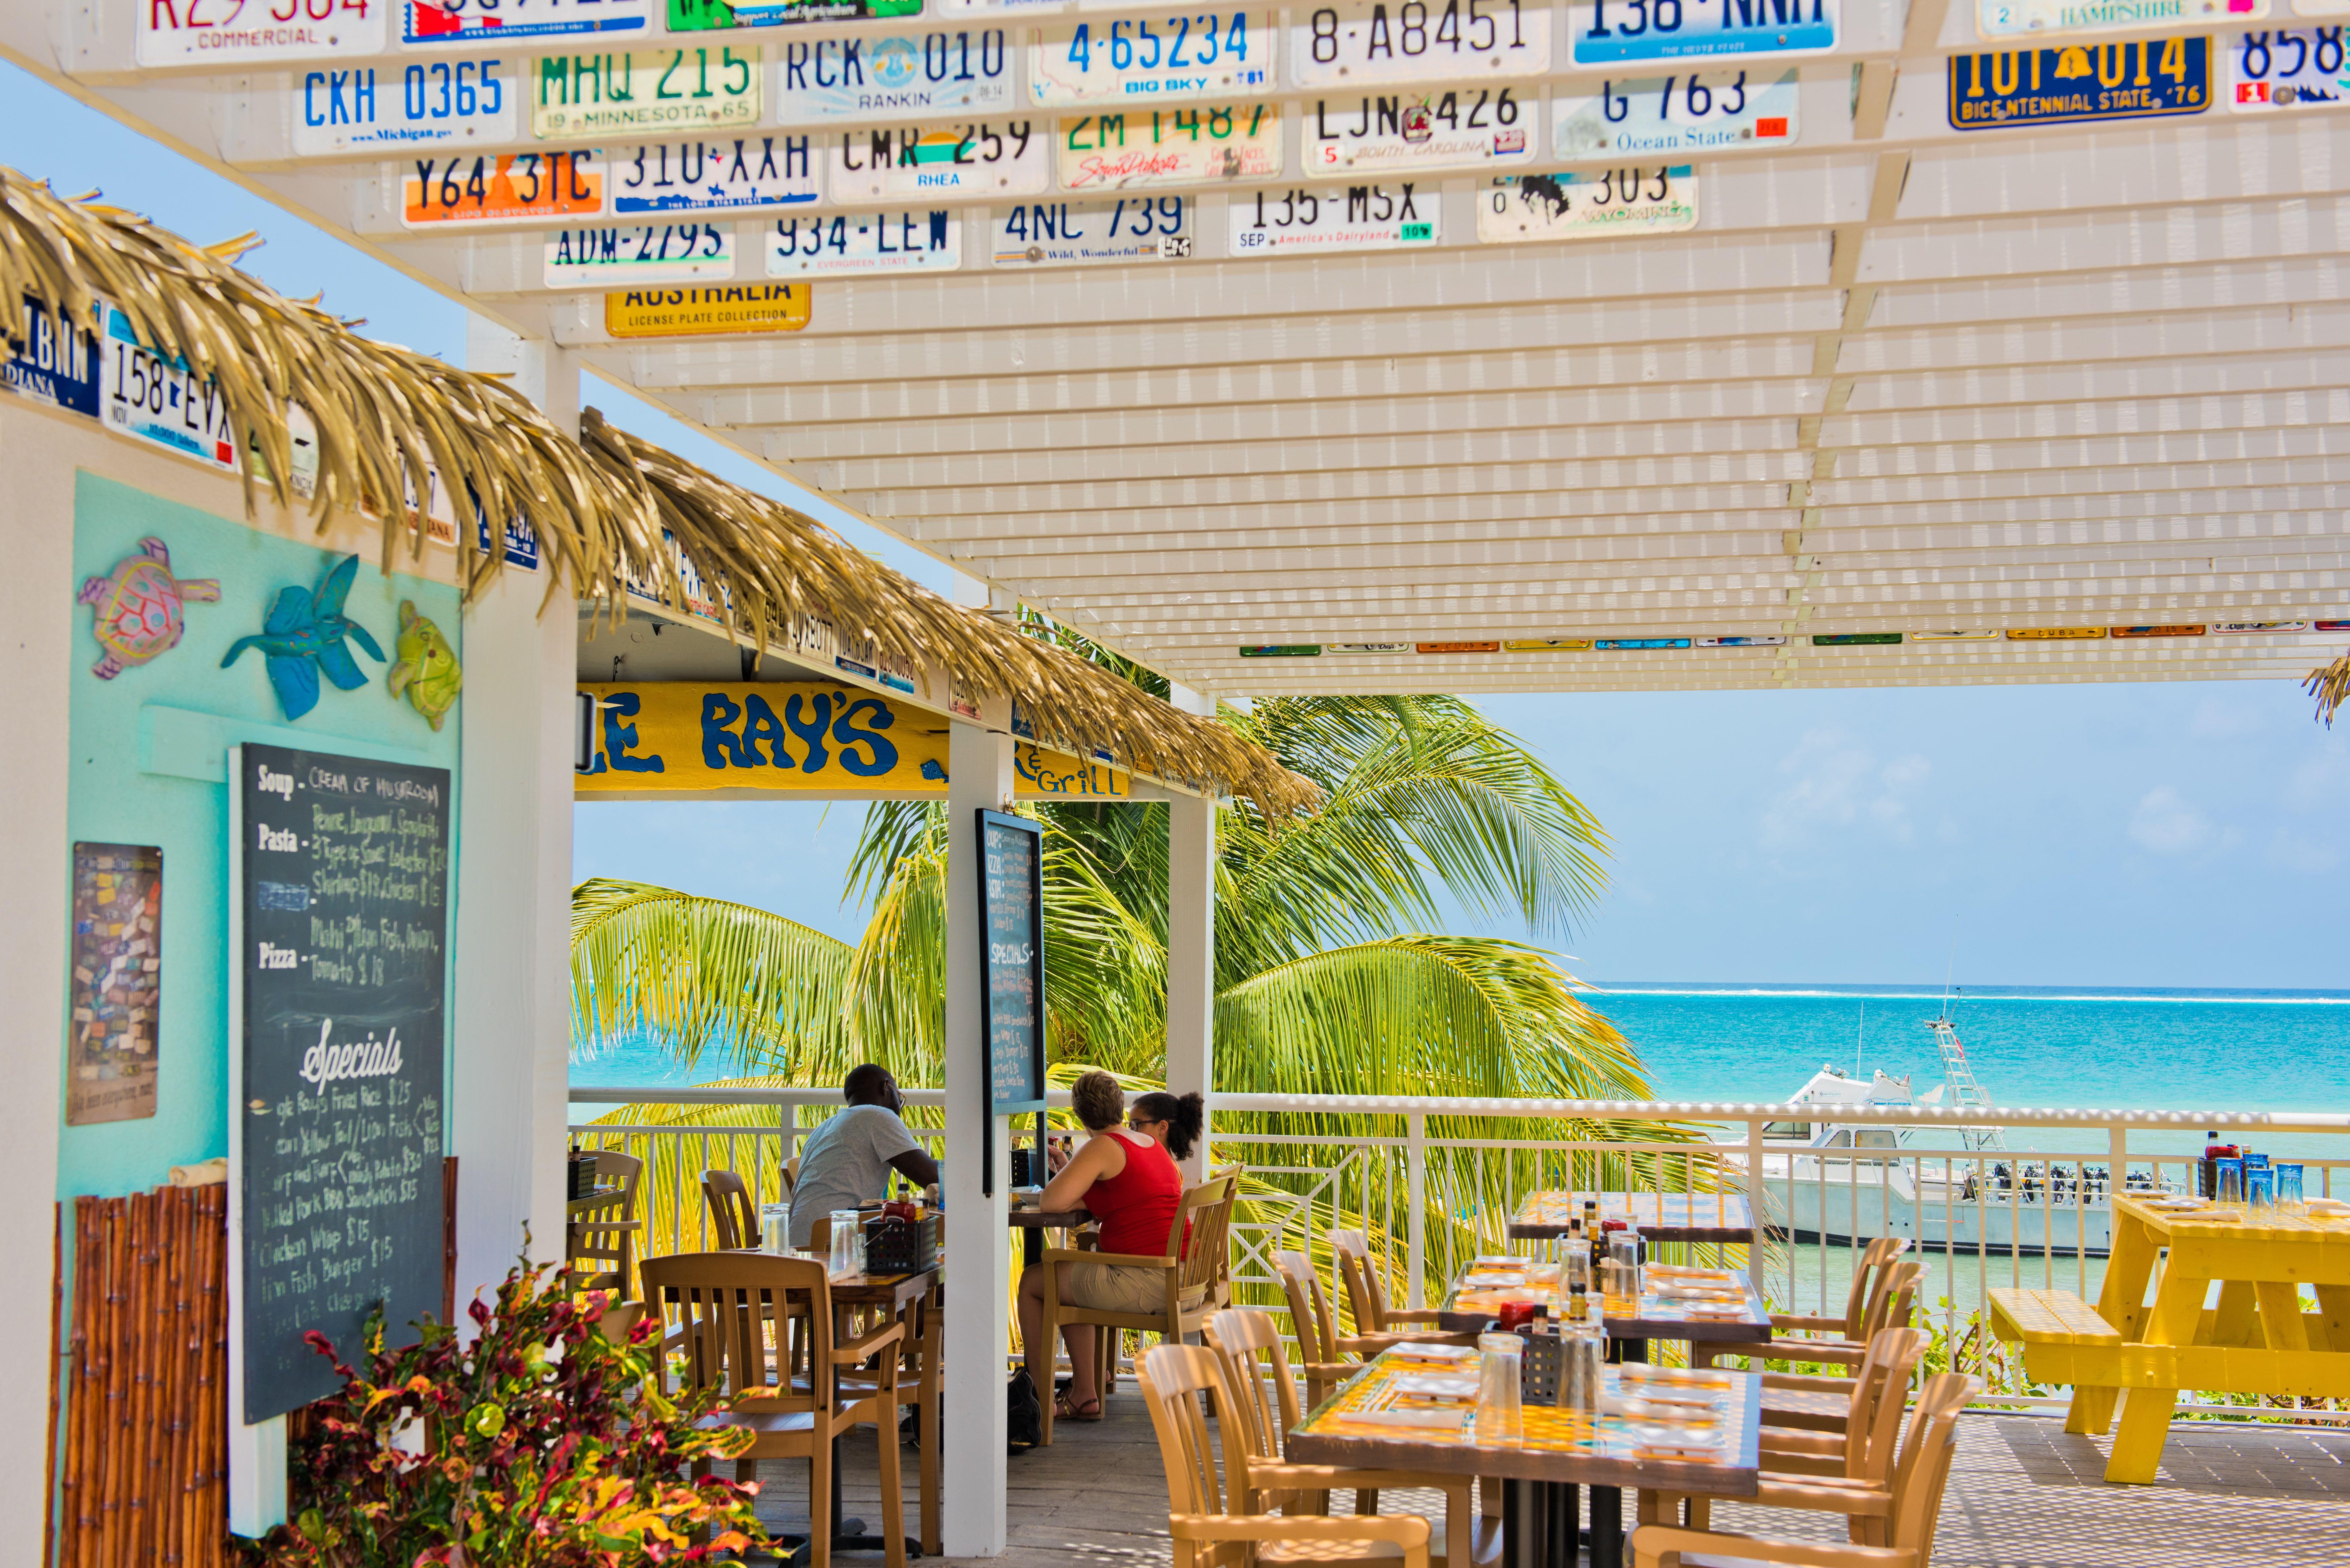 Eagle Rays Cayman Outside Deck